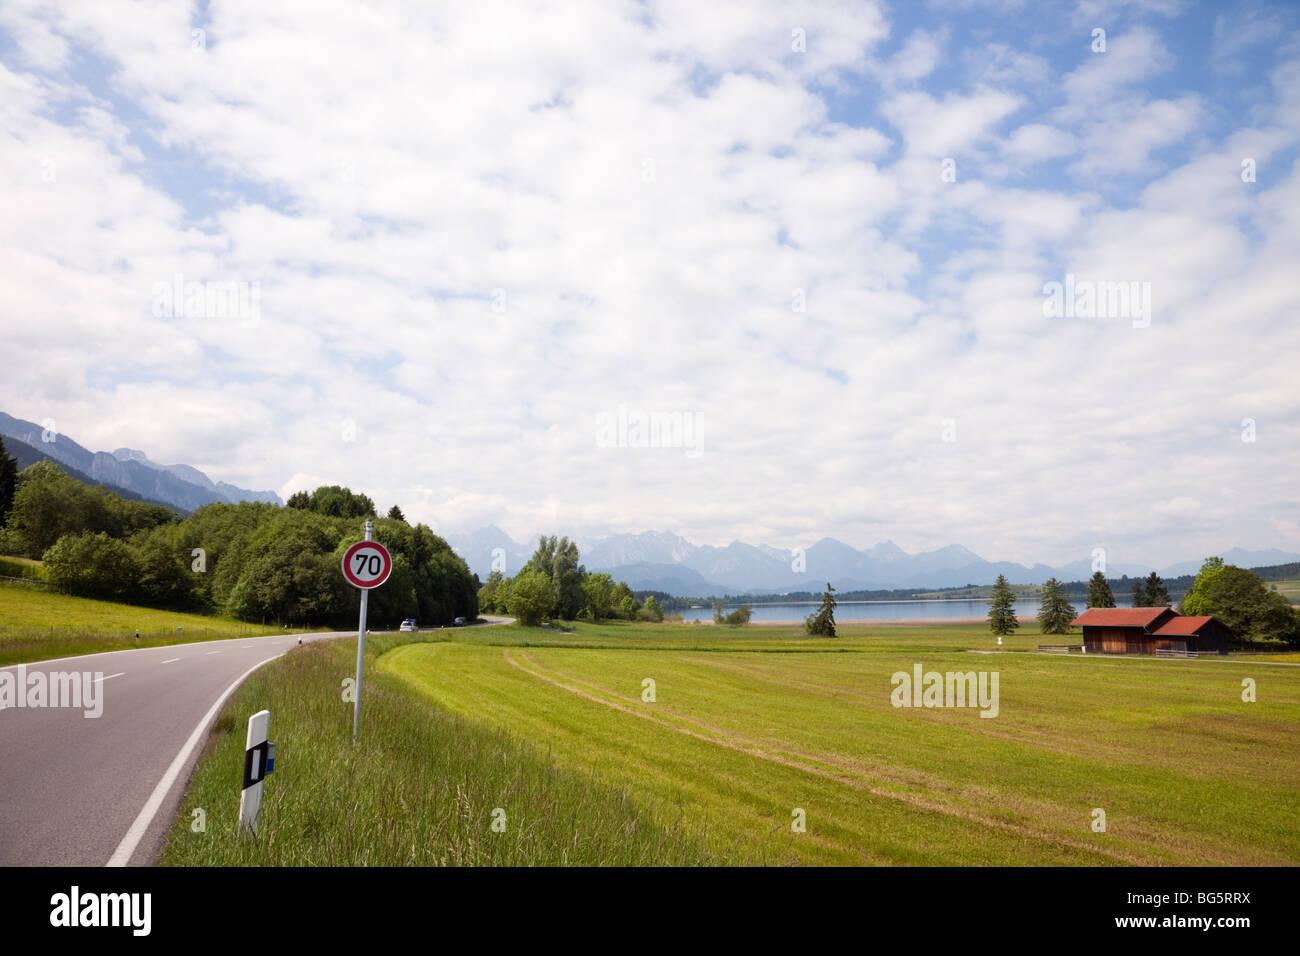 The Romantic Road (Romantische Strasse) tourist route near Lake Bannwaldsee in the Bavarian Alps. Schwangau Bavaria - Stock Image